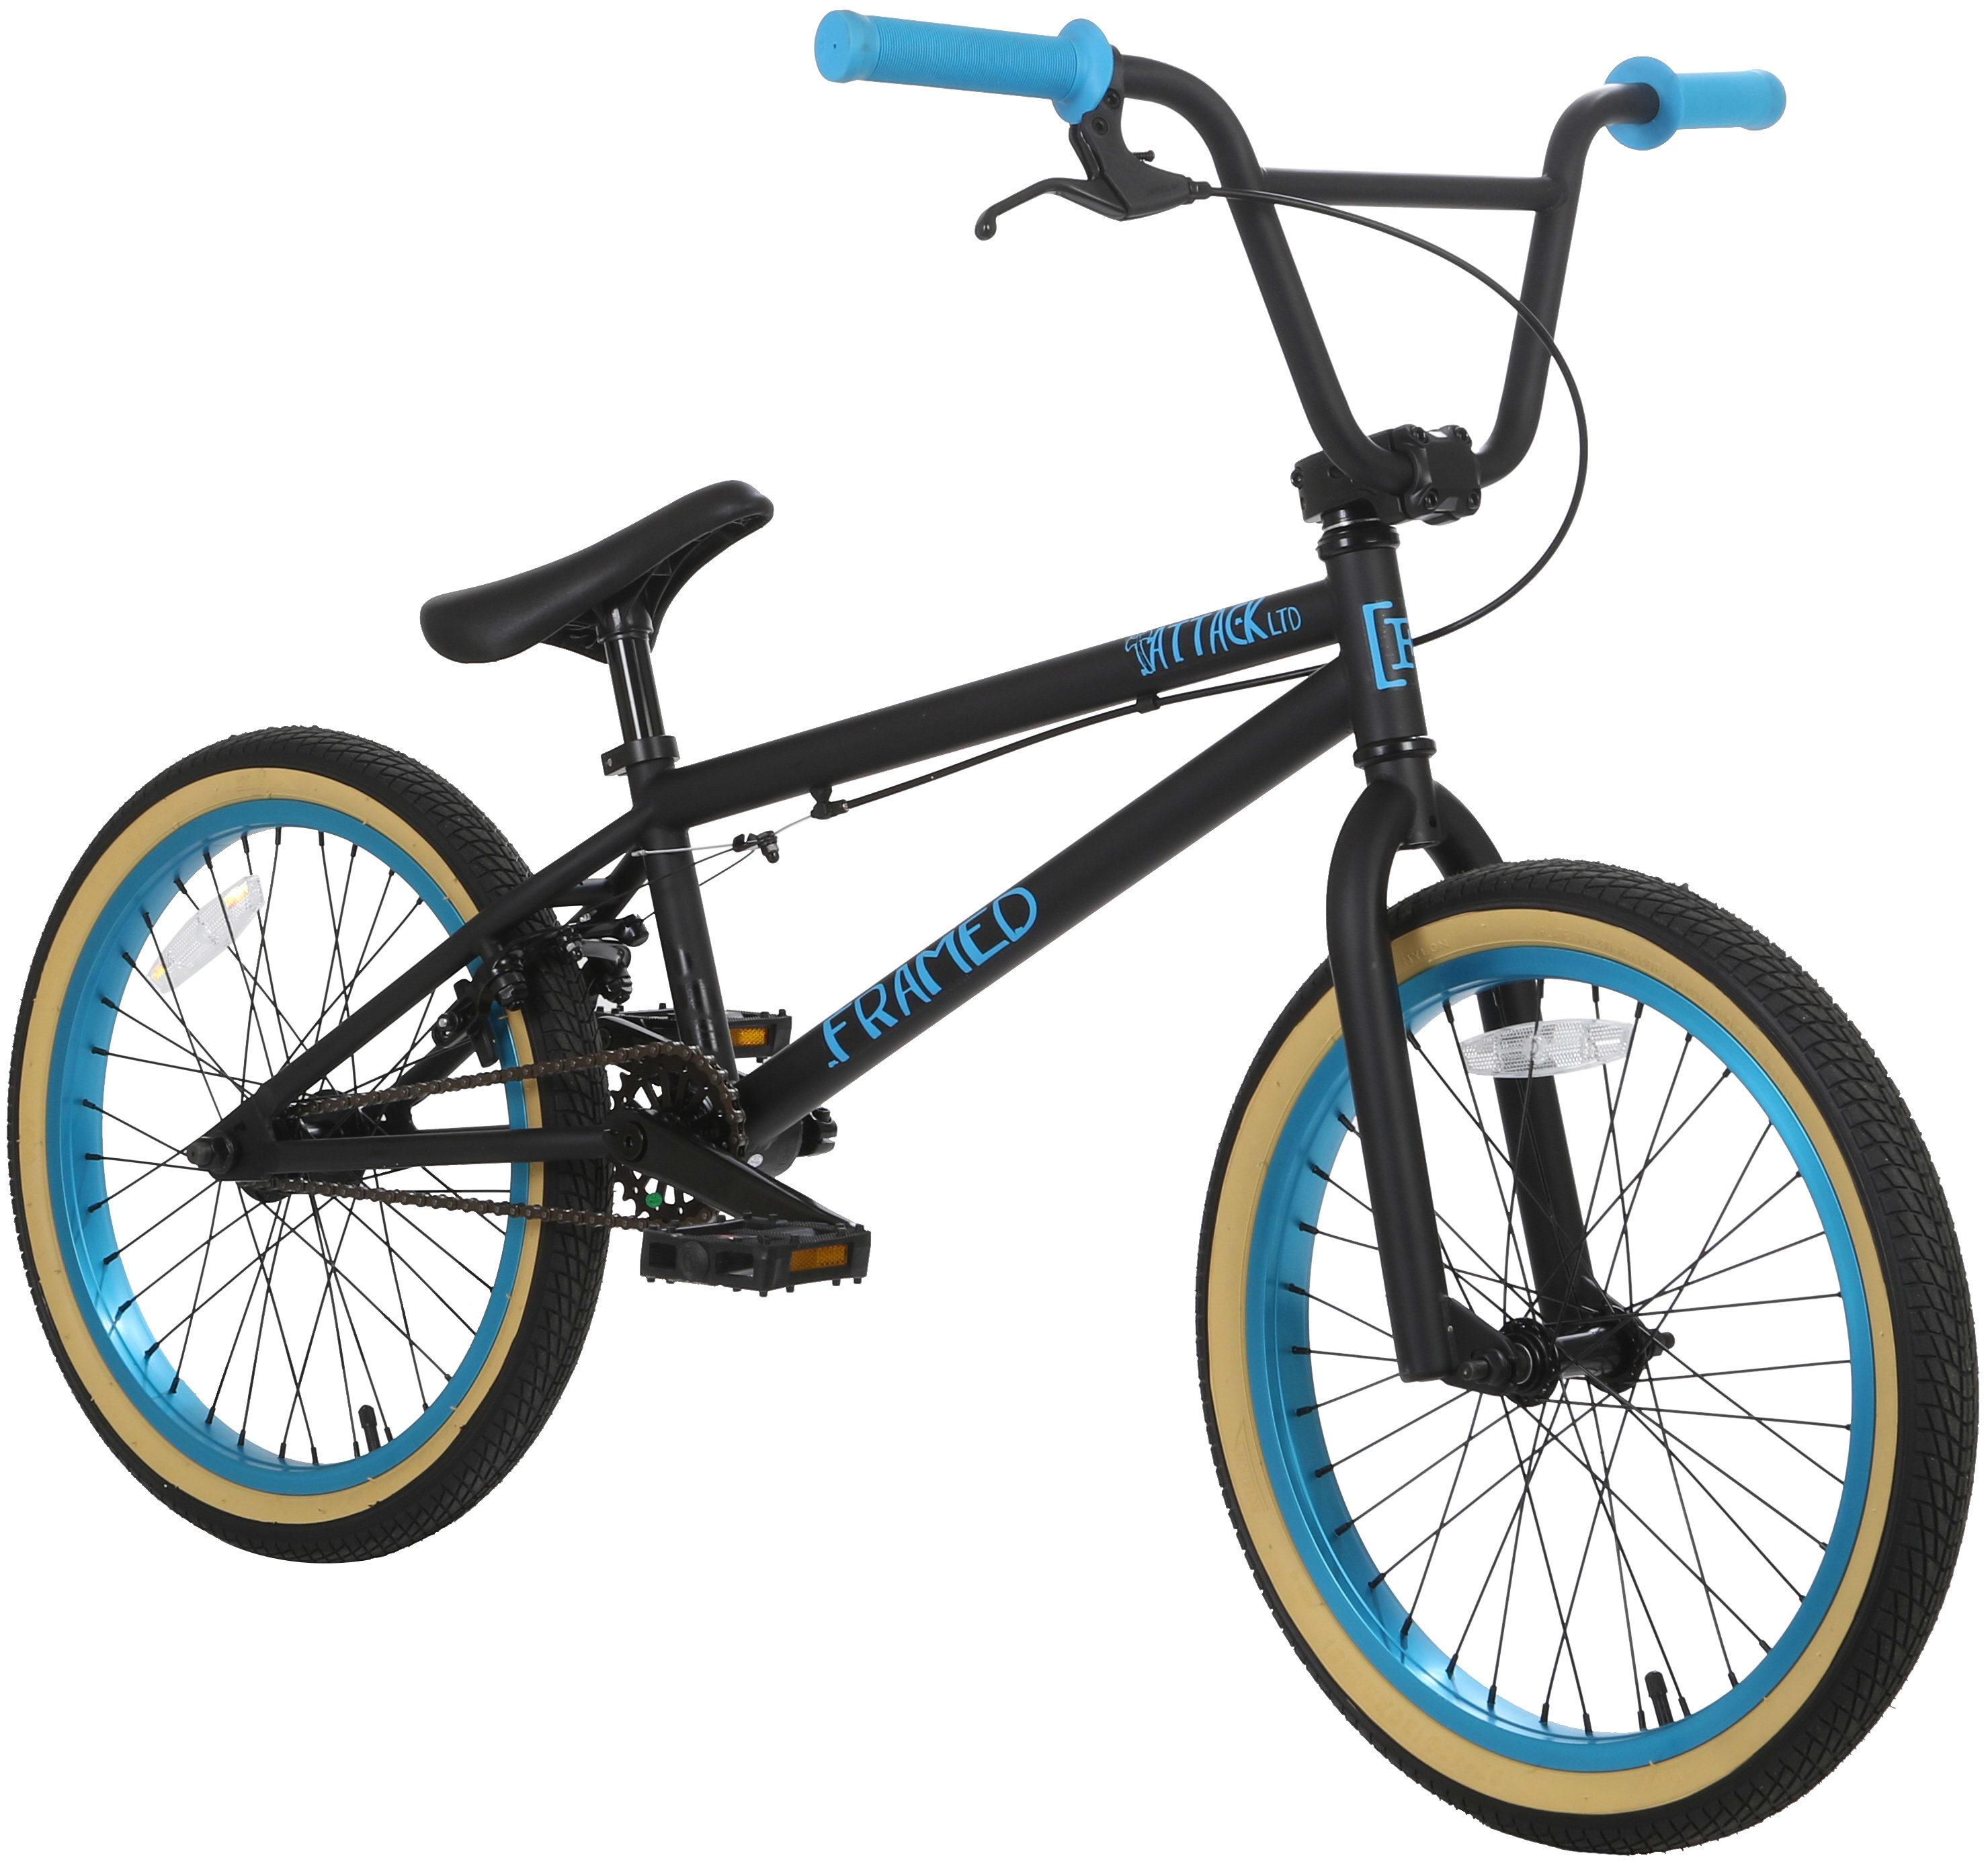 Framed Attack LTD BMX Bike